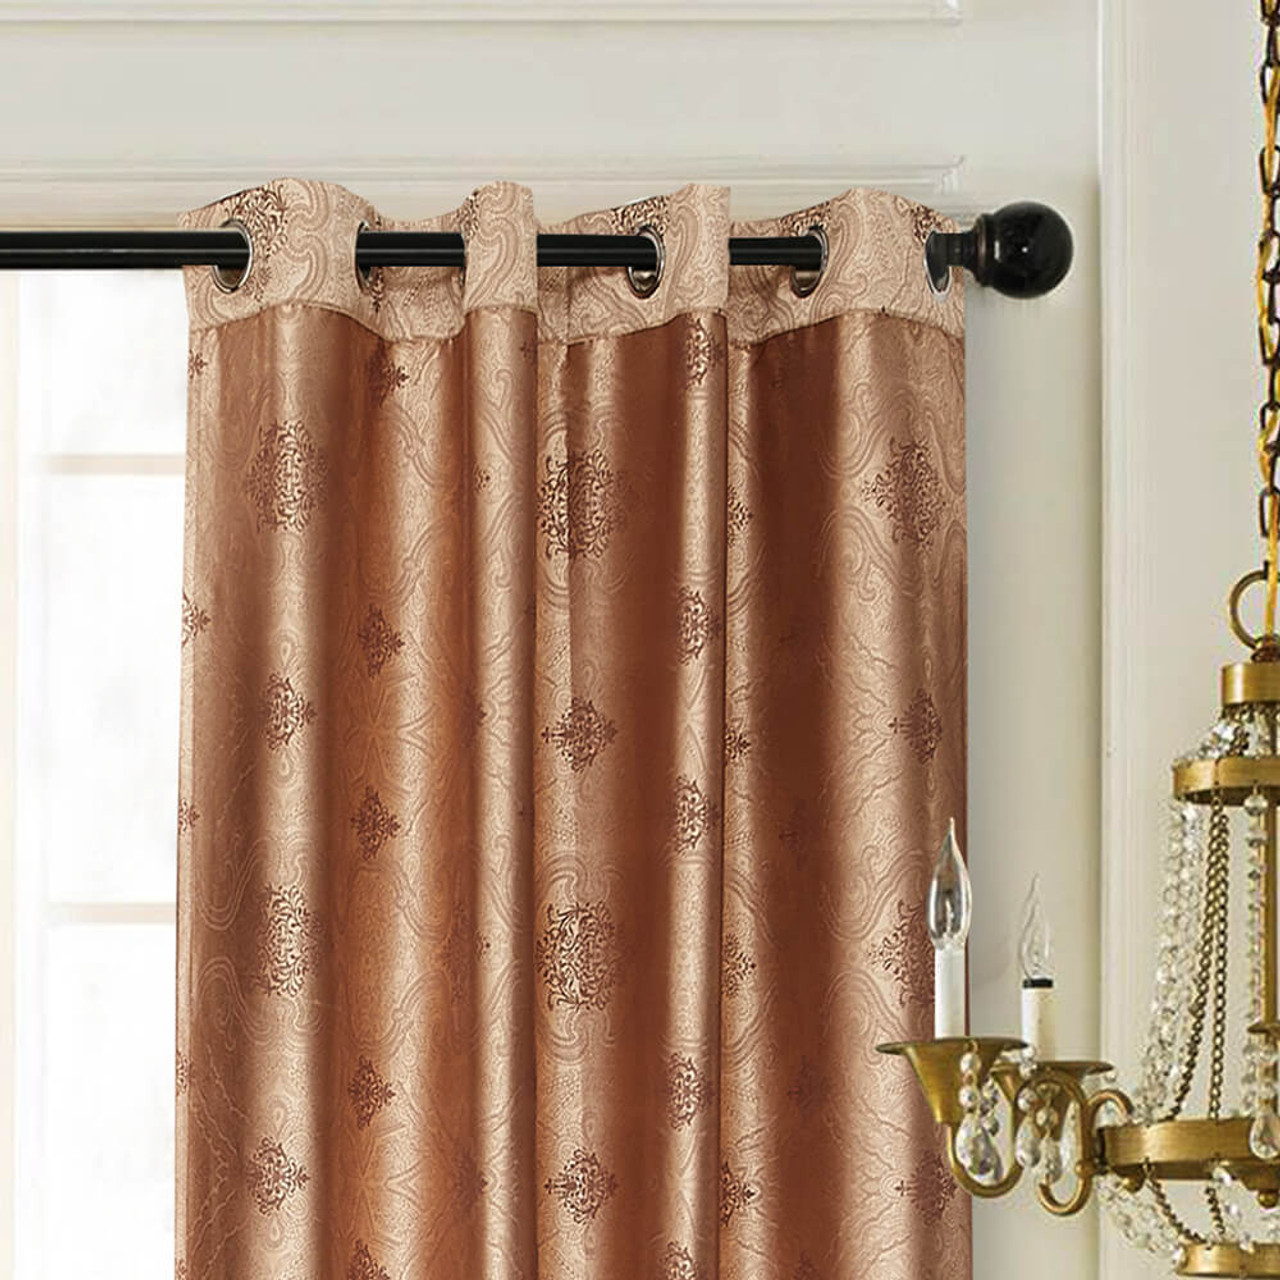 Curtain Panel Semi-Blackout Drapes, DMC719 Dolce Mela Los Angeles Window Treatments